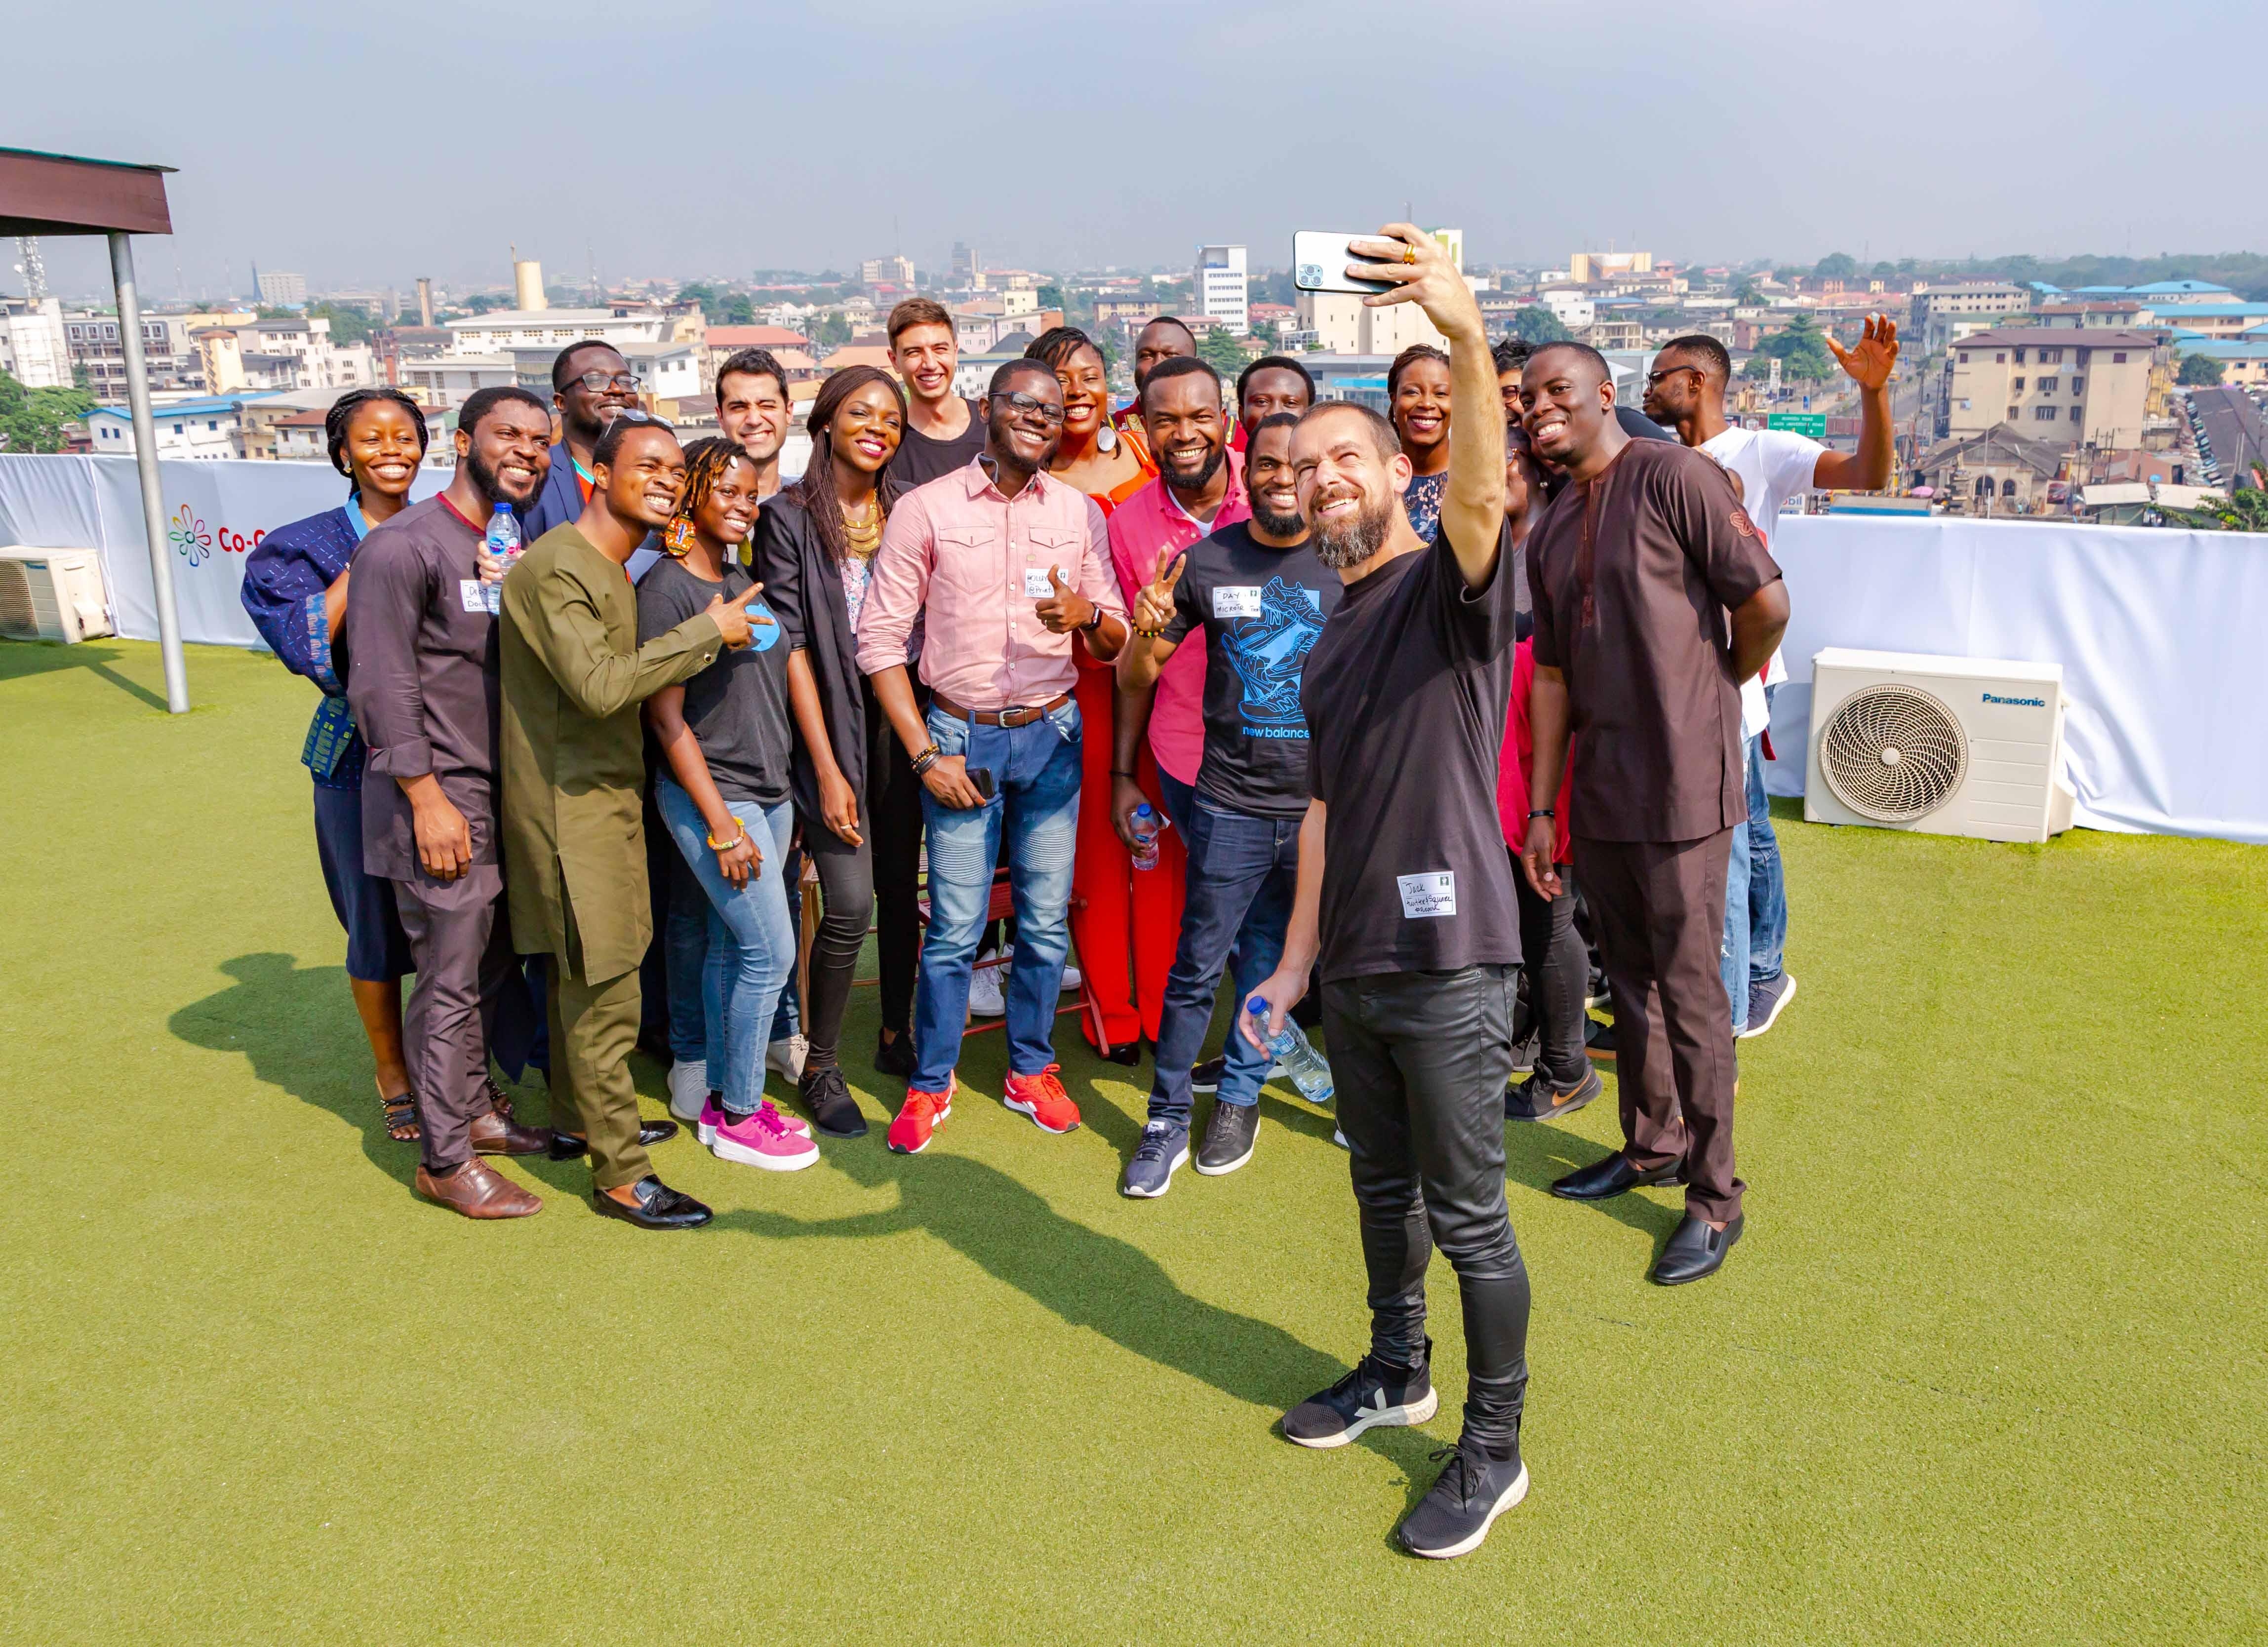 Nigeria is becoming Africa's unofficial tech capital | TechCrunch